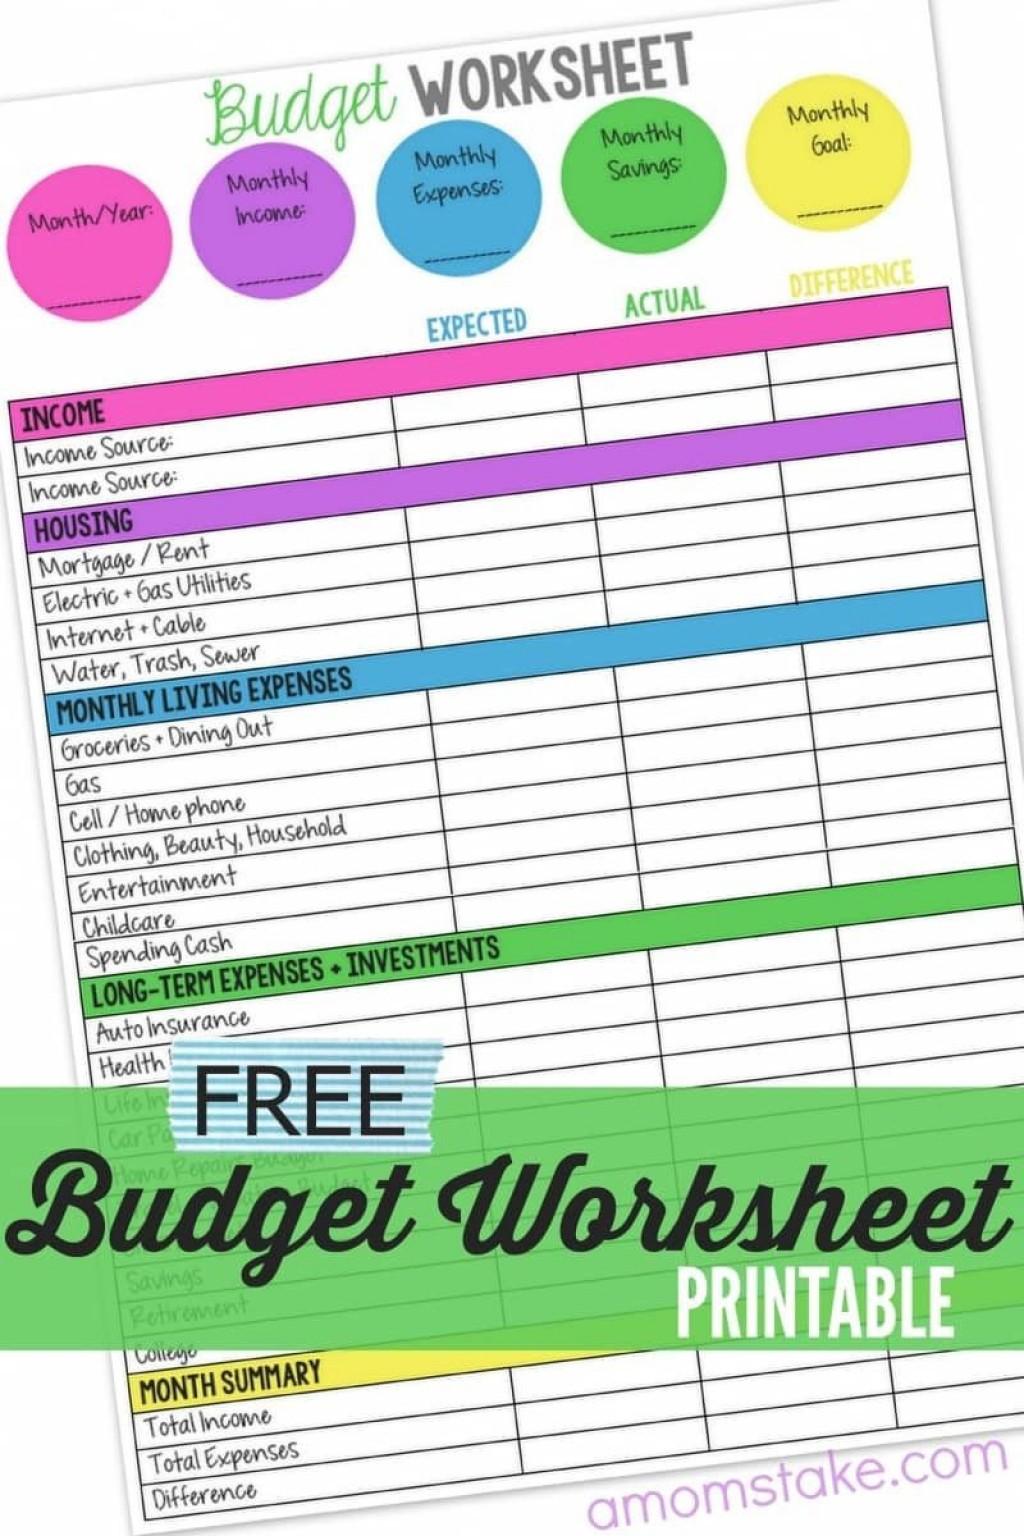 005 Sensational Free Monthly Budget Template Printable Image  Simple Worksheet Household Planner UkLarge